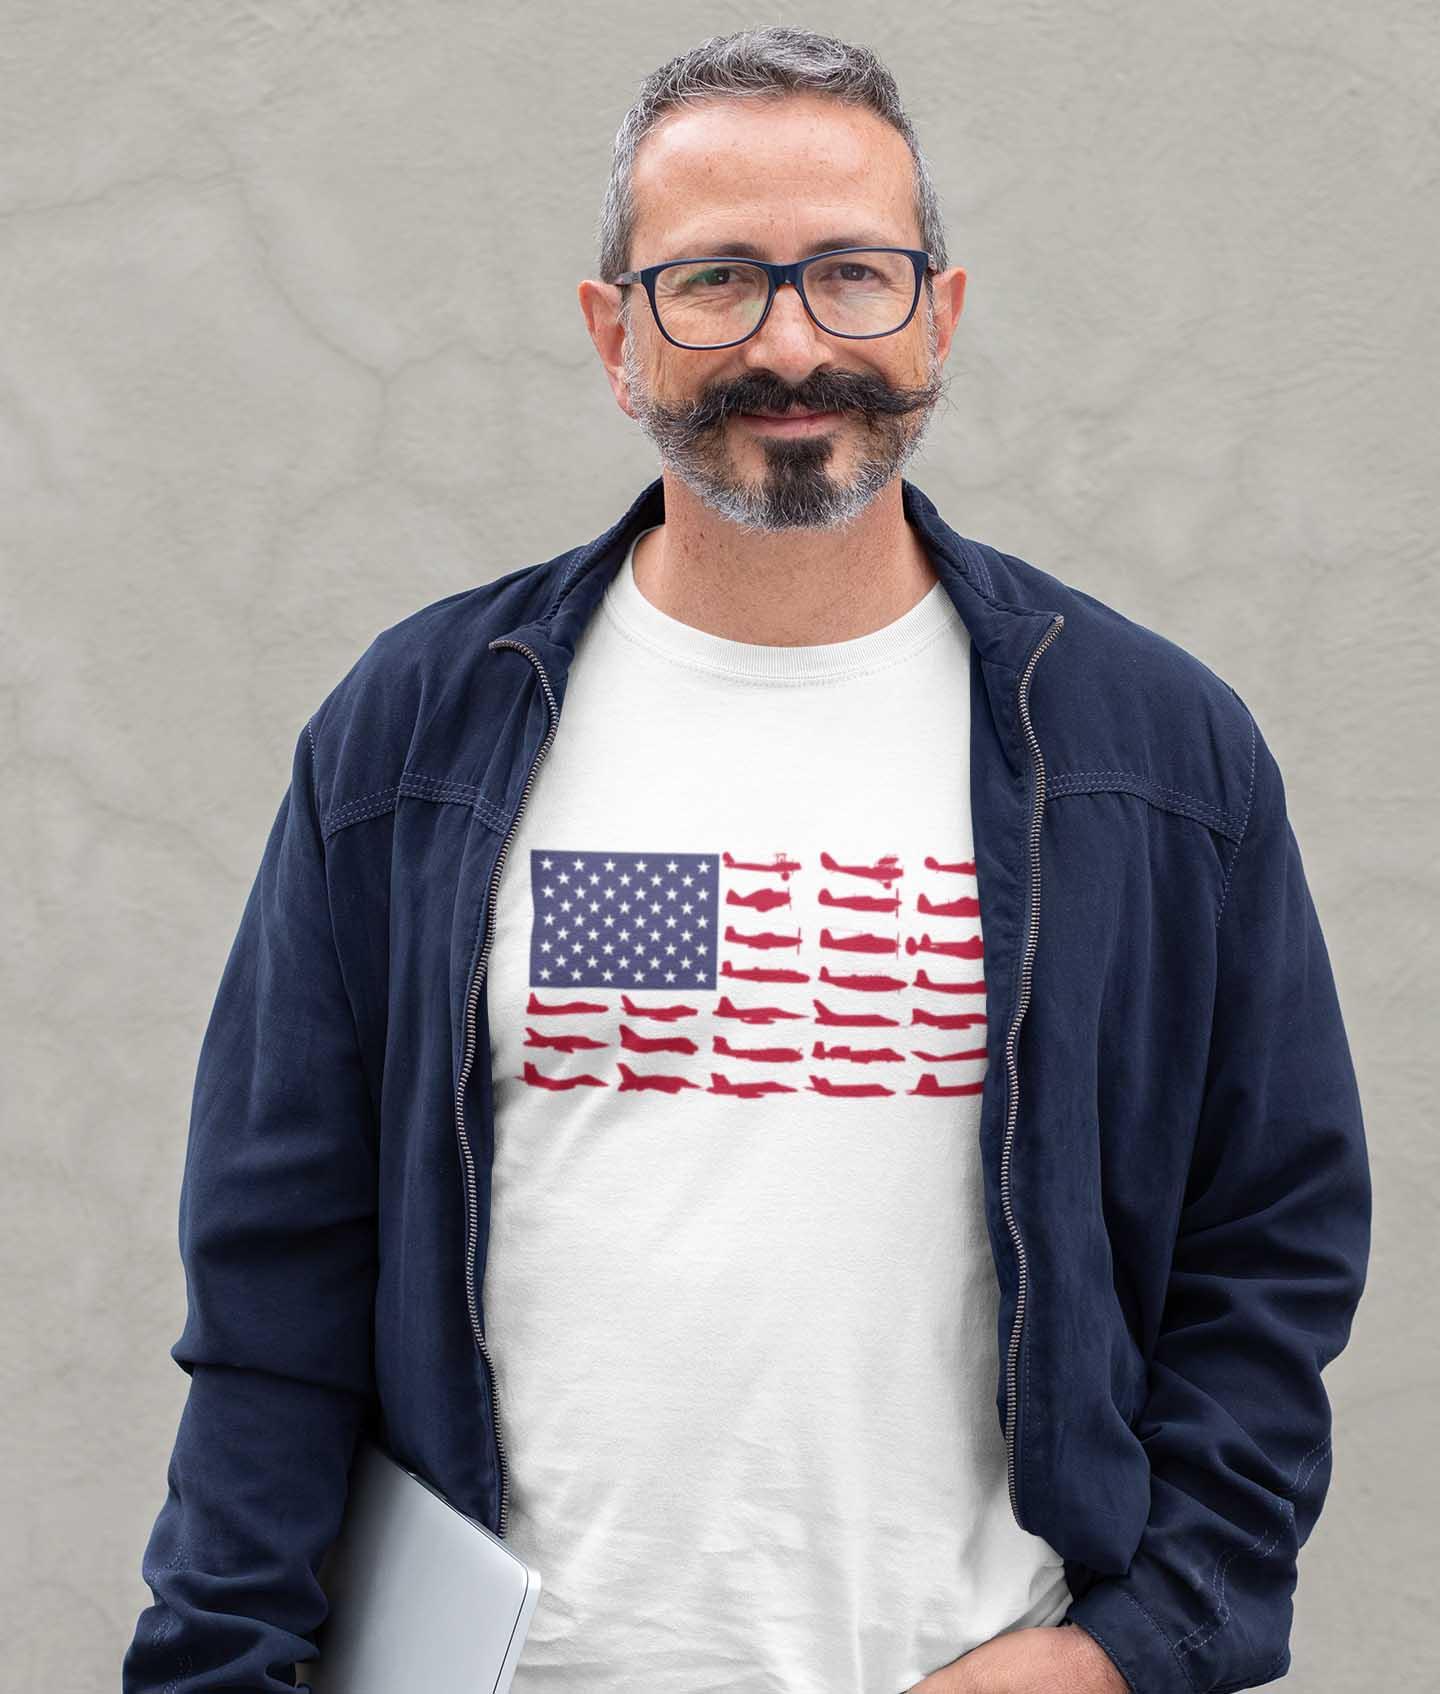 american flag aircraft t shirt